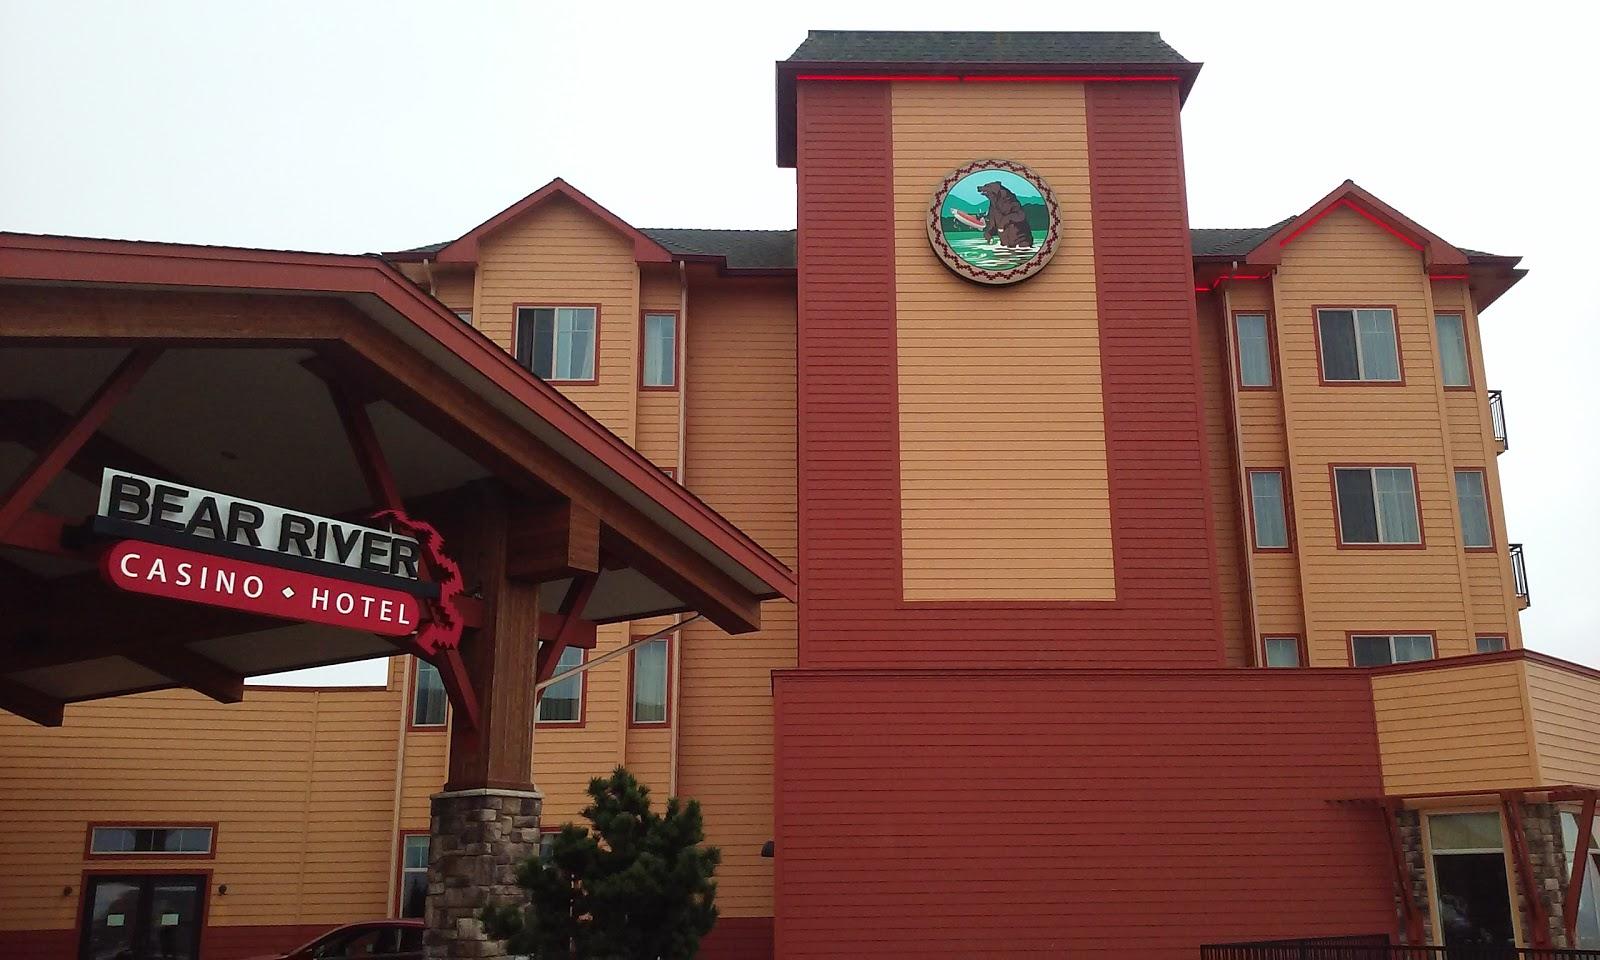 Bear River Casino Resort Outplanet